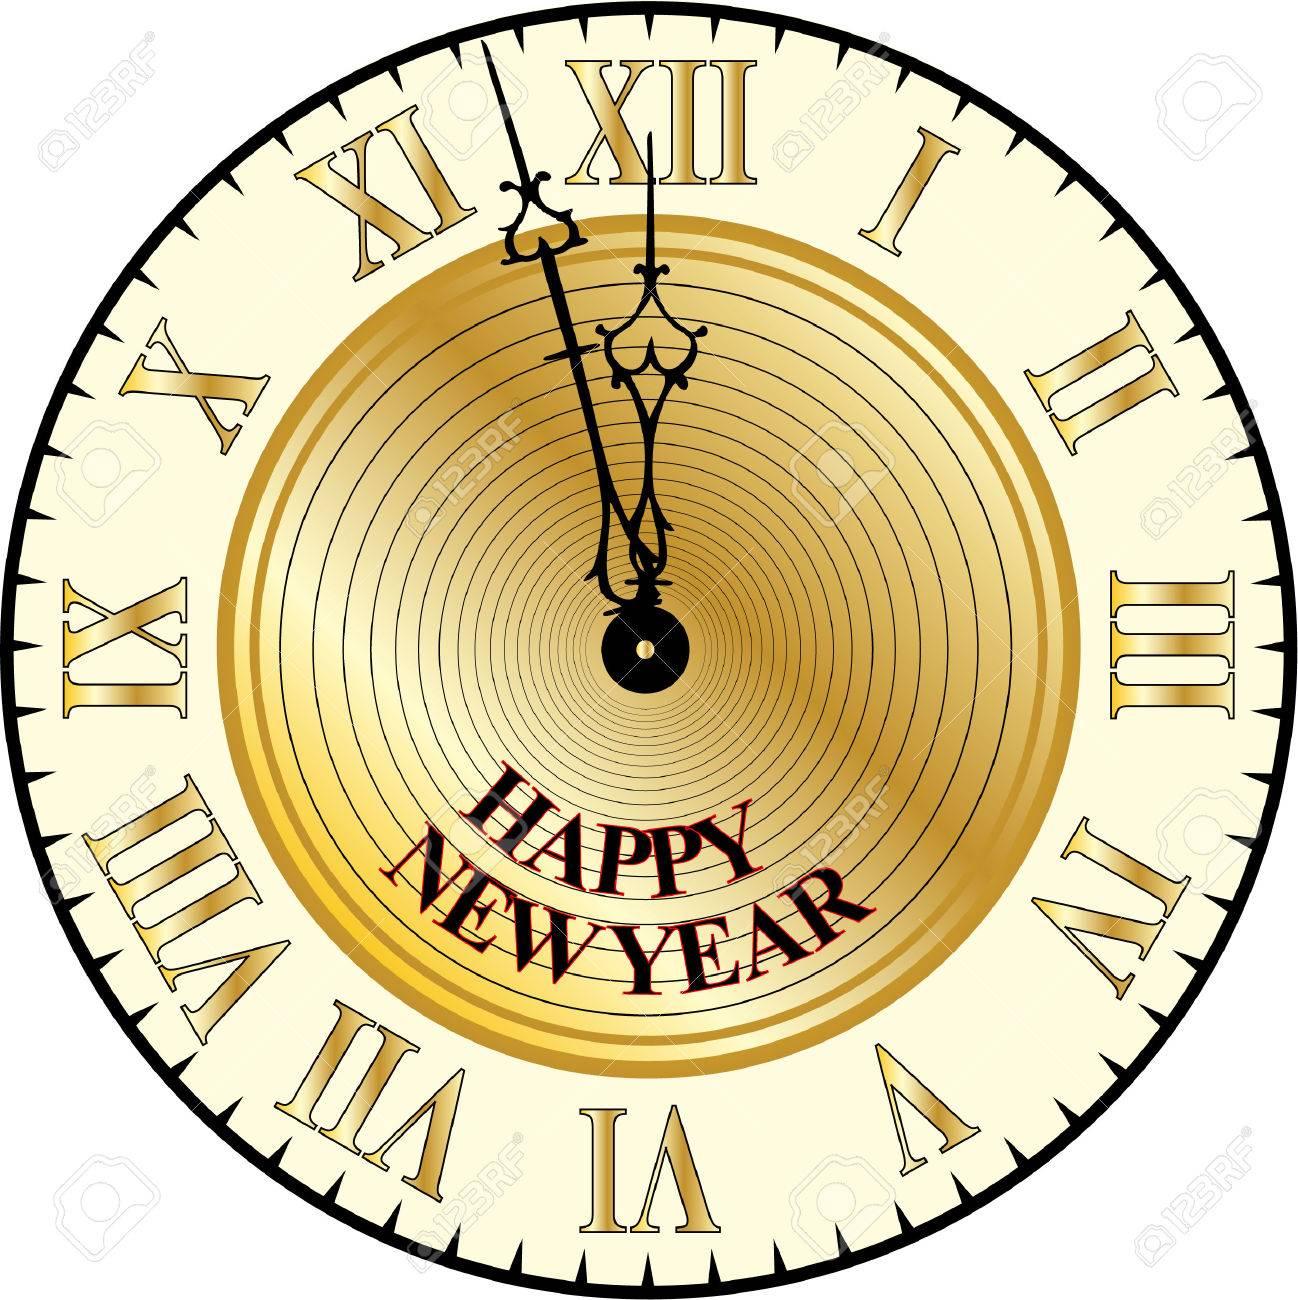 Clocks clipart new year\'s eve, Clocks new year\'s eve.